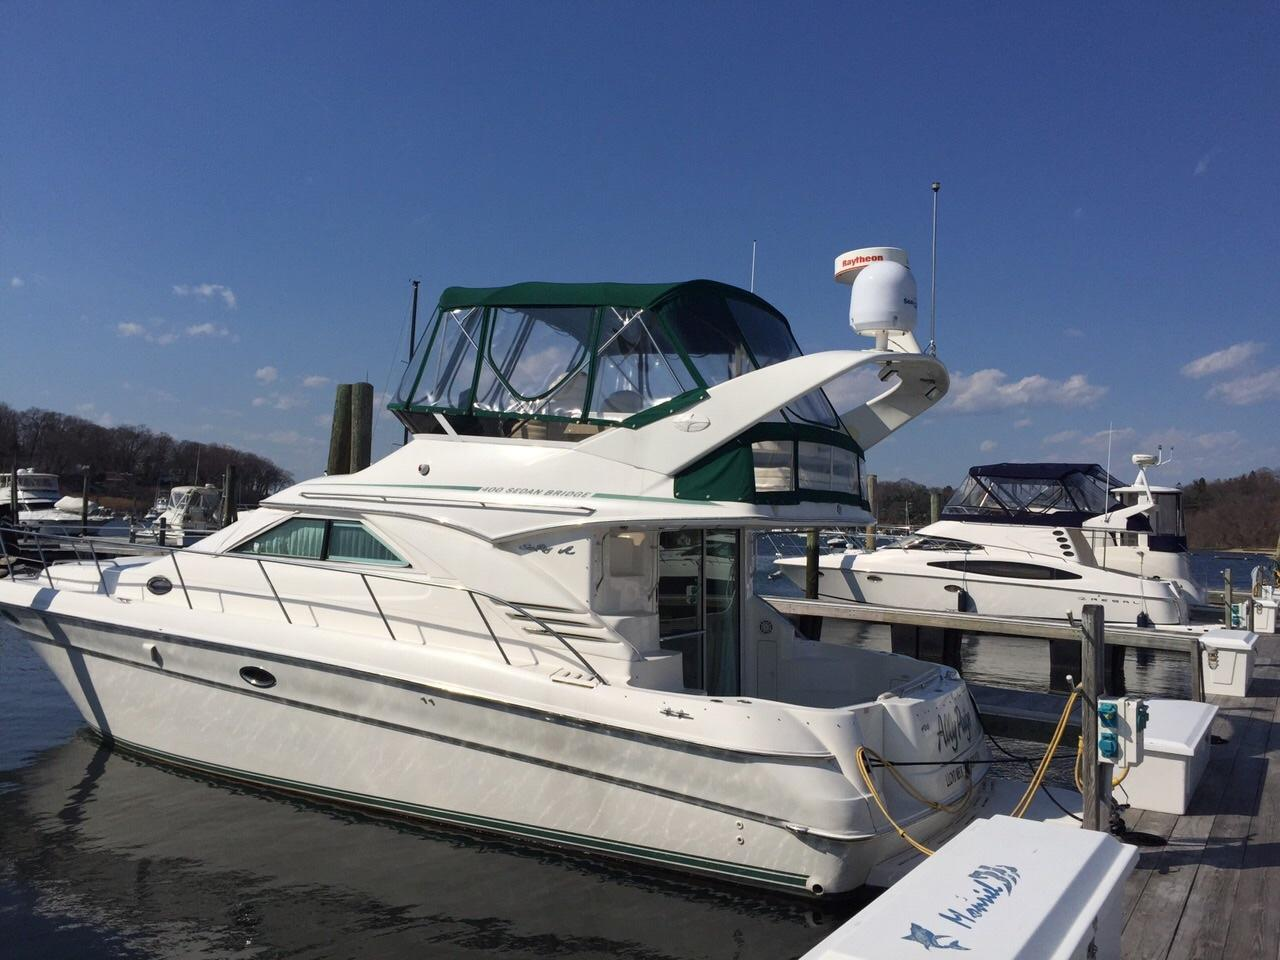 6195844_20170406072202821_1_XLARGE&w=924&h=693&t=1491492154000 2000 sea ray 400 sedan bridge power boat for sale www yachtworld com  at webbmarketing.co